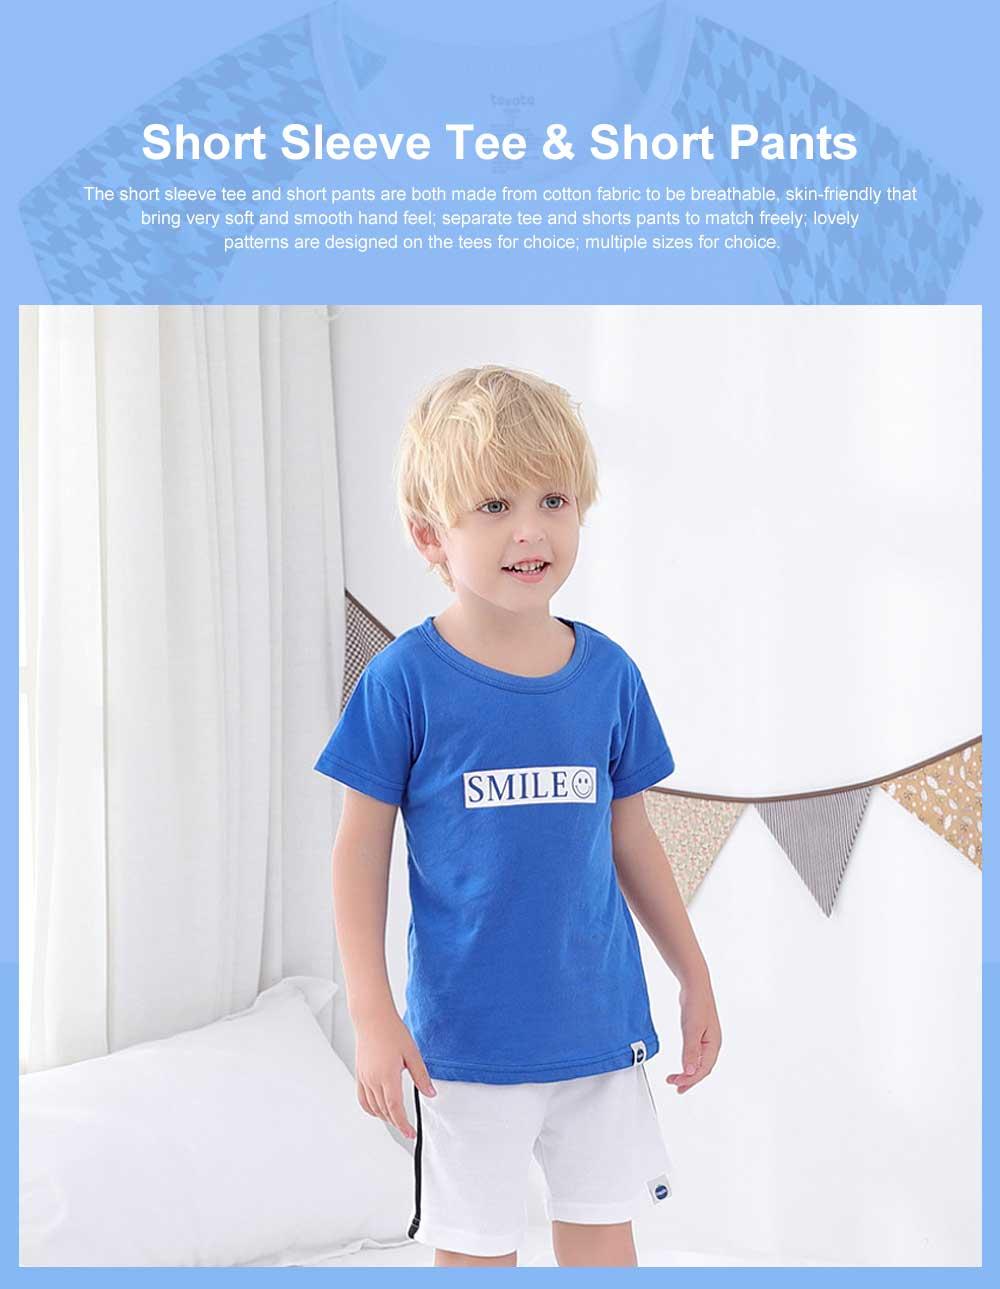 Pure Cotton Cartoon Short Sleeve T-shirt for Unisex Babies Wear in Summer Korean Style Waling Dress for Children Short Pants Children Wear 0